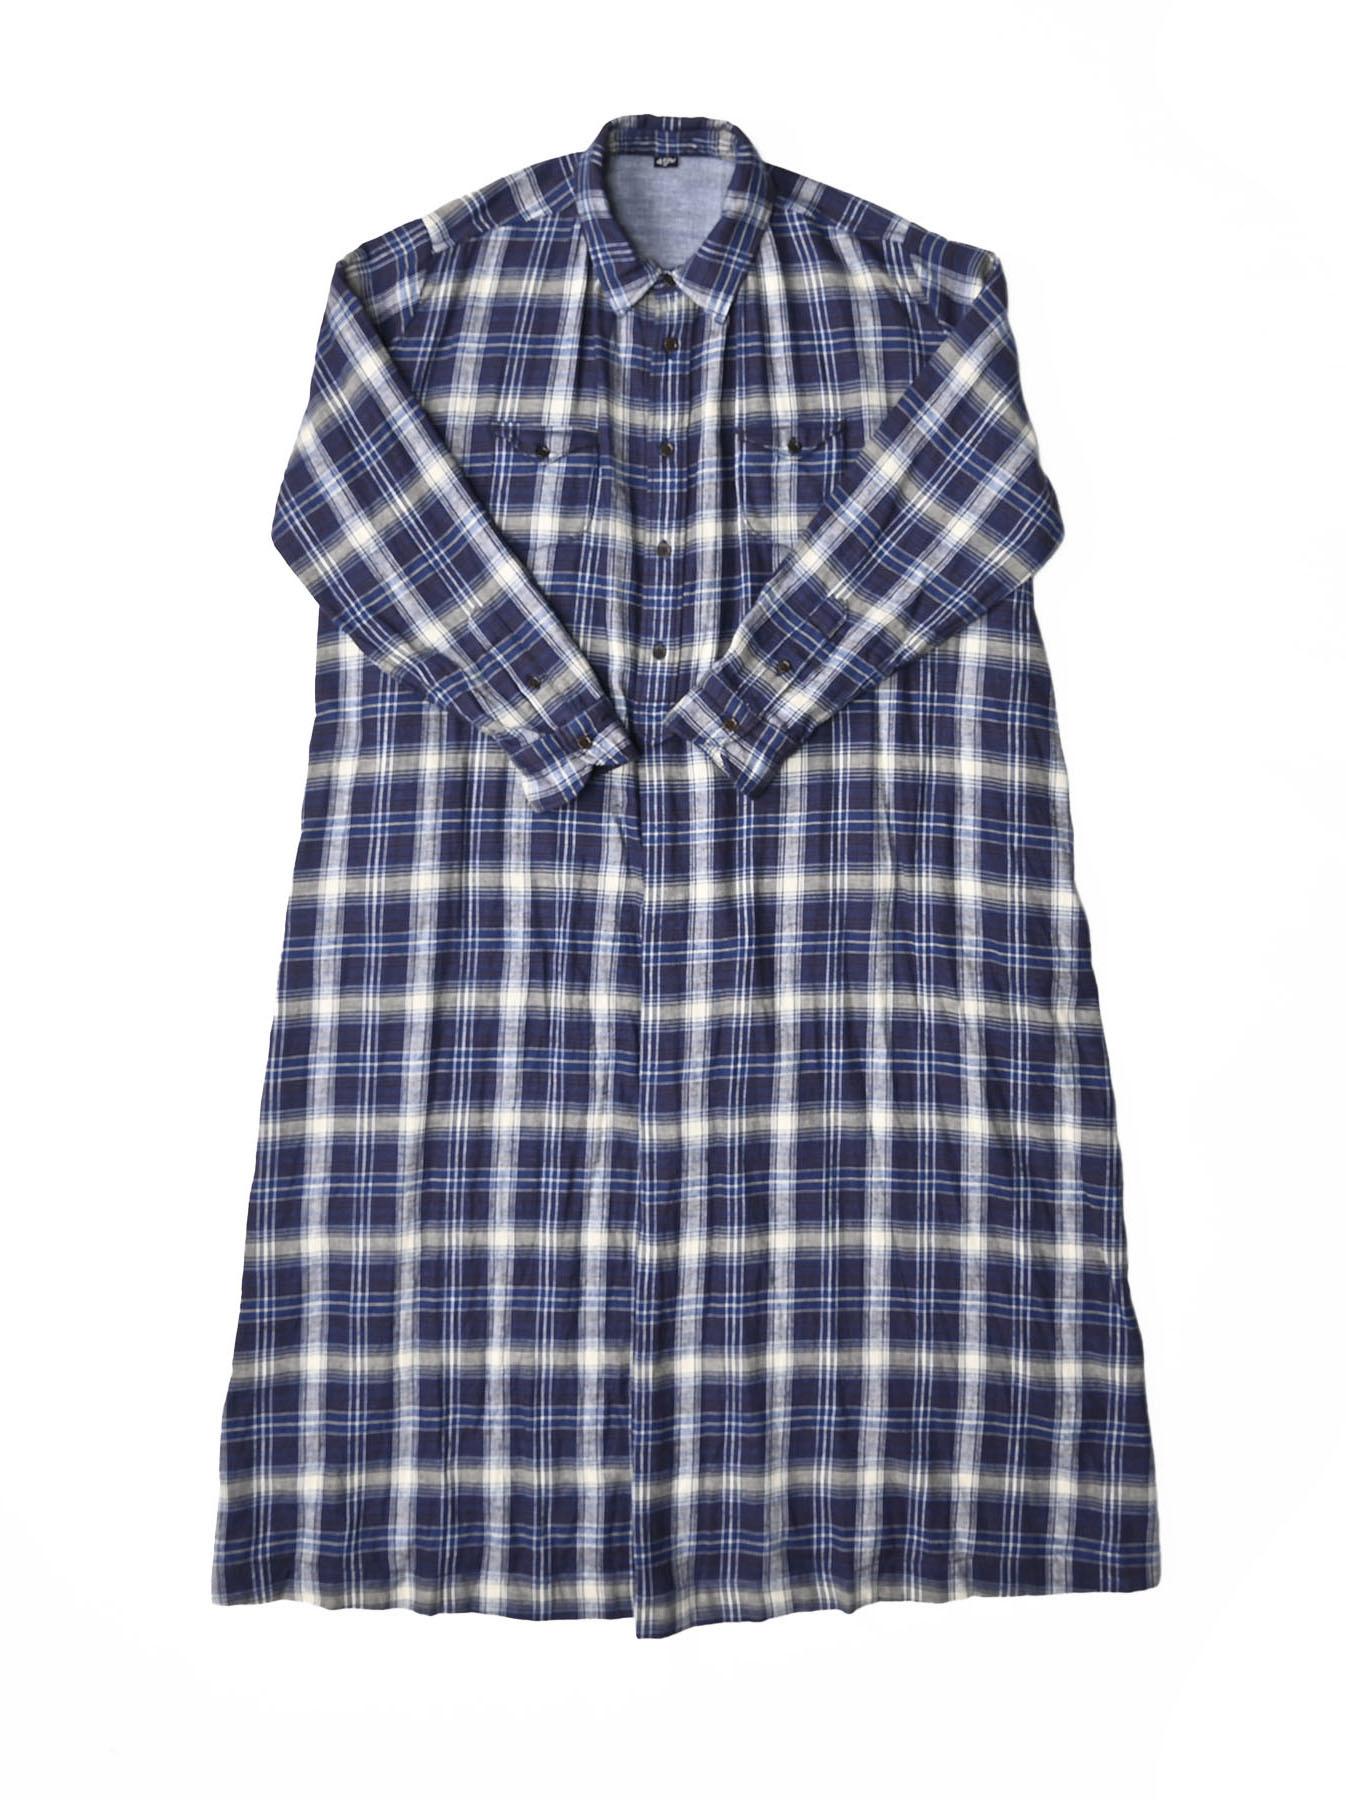 Indigo Twill Double Cloth Shirt Dress-1